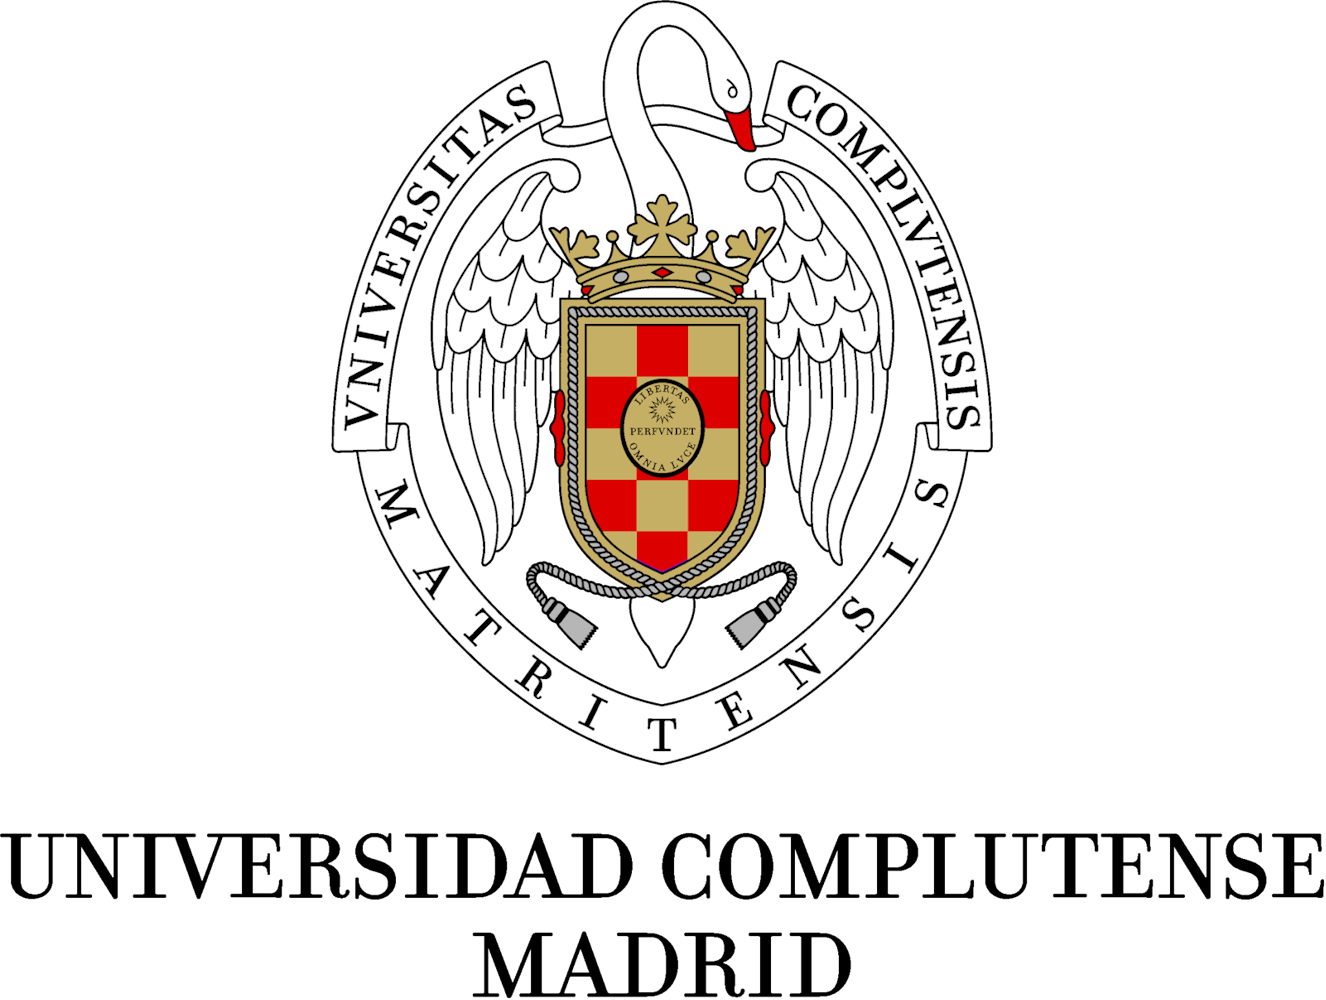 Universidad Complutense de Madrid_Plunet academy program